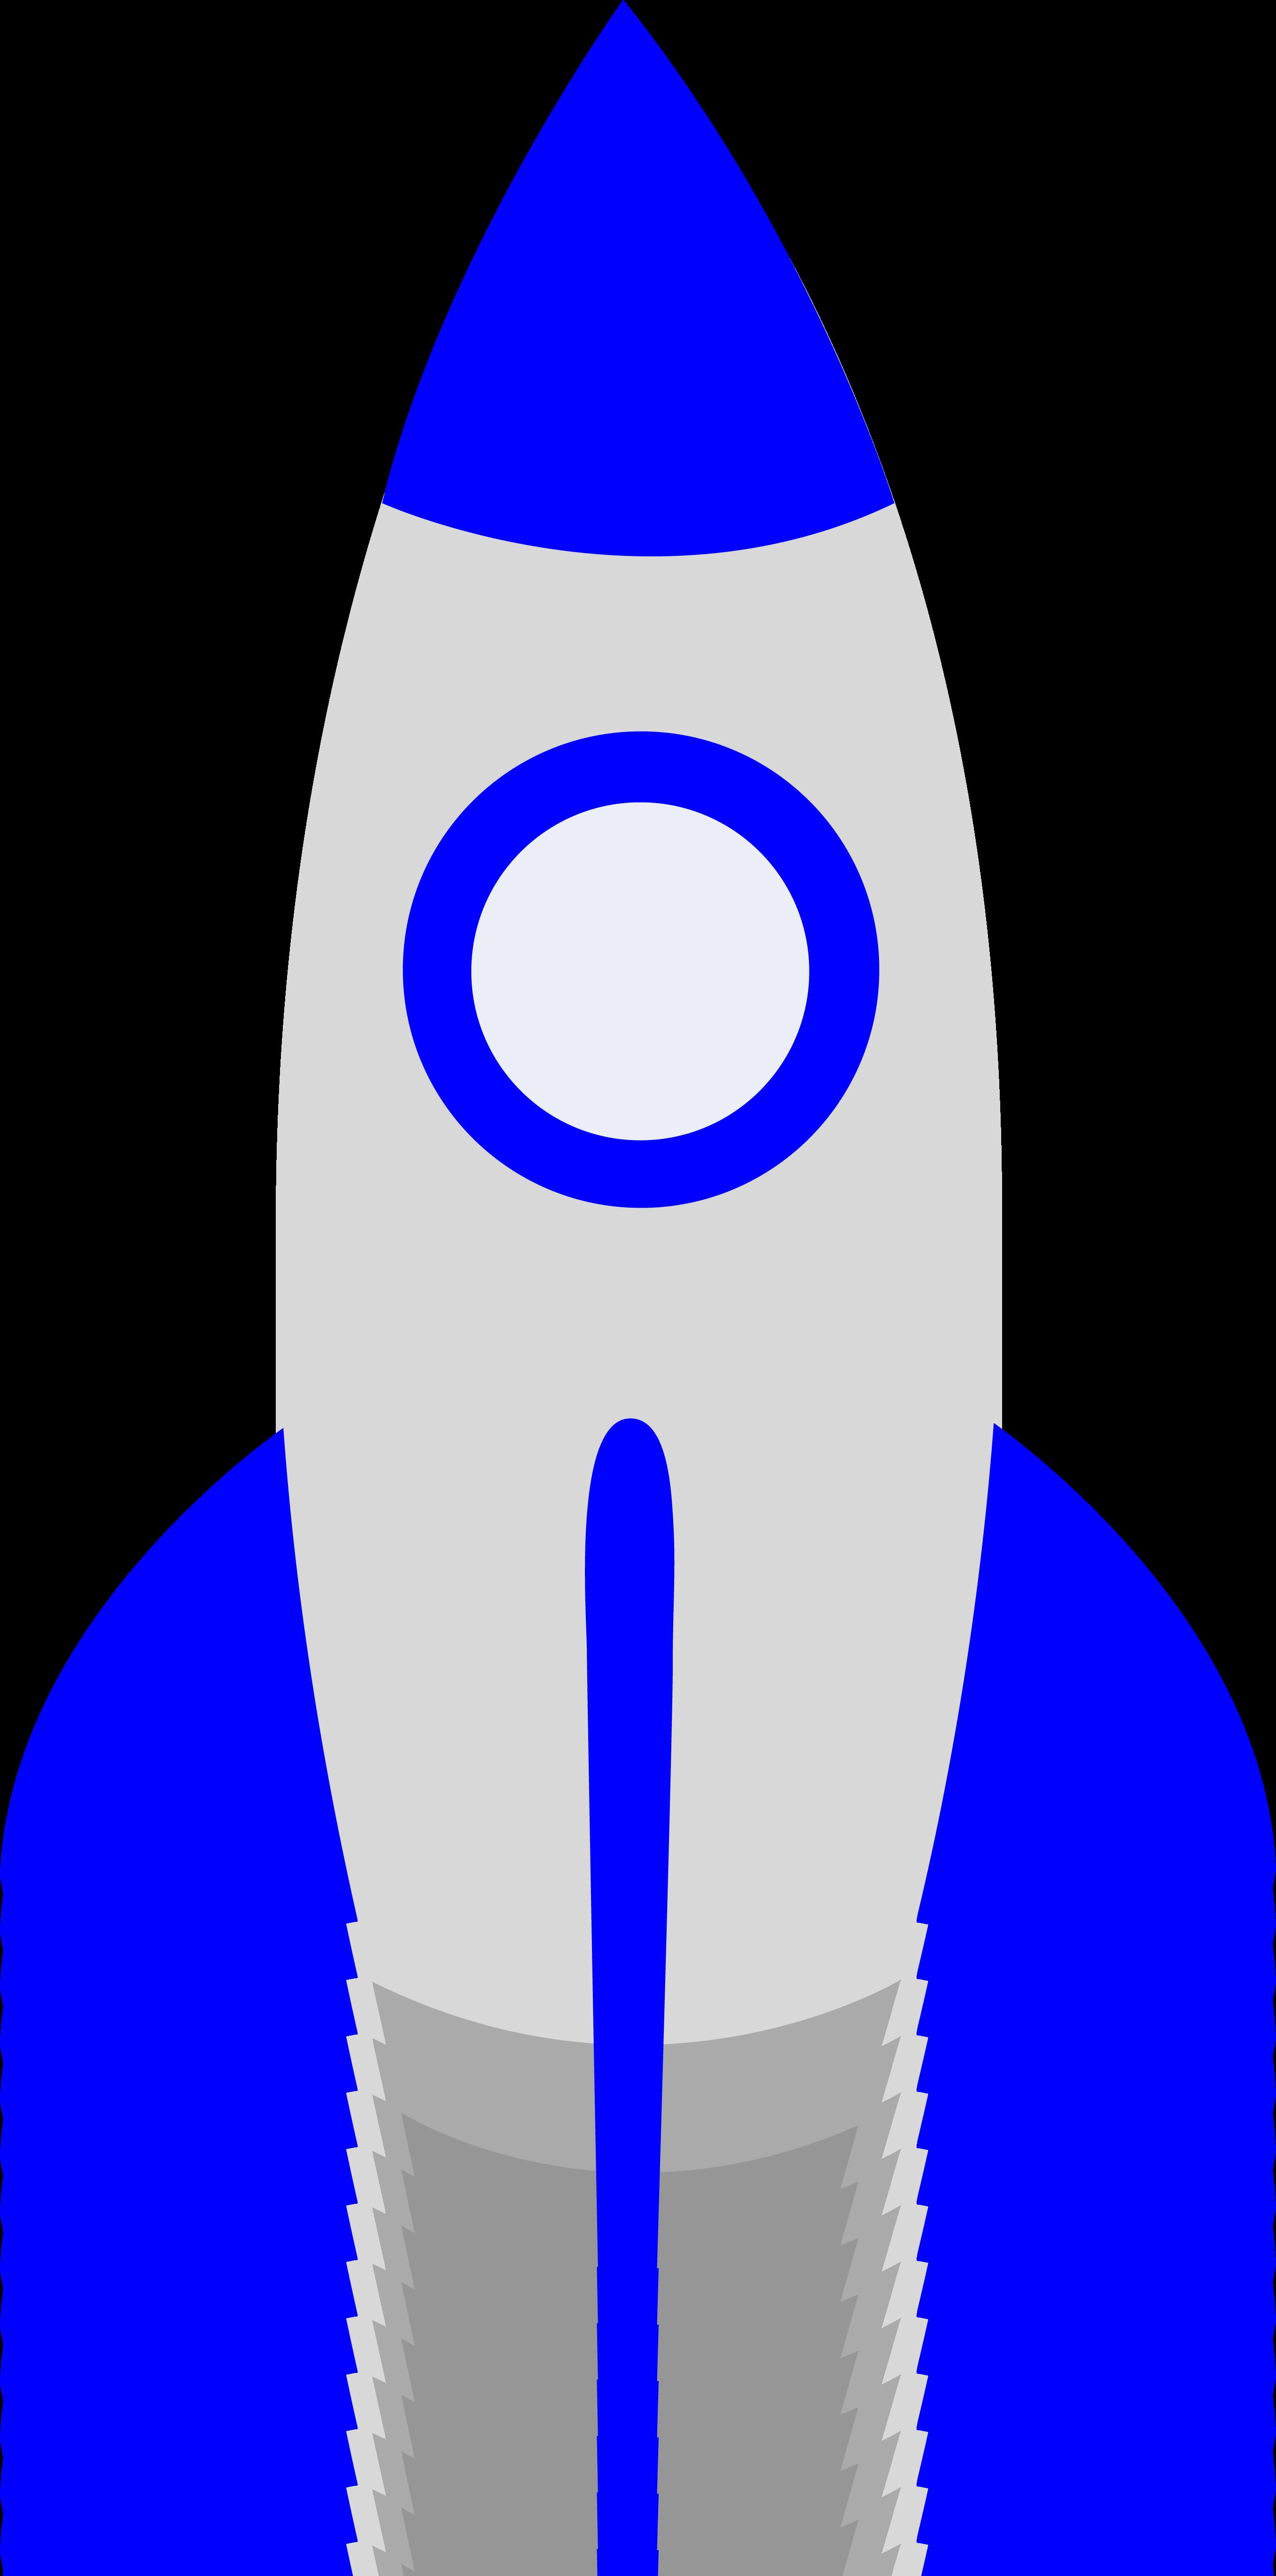 Cute Blue Retro Rocket   Thema .